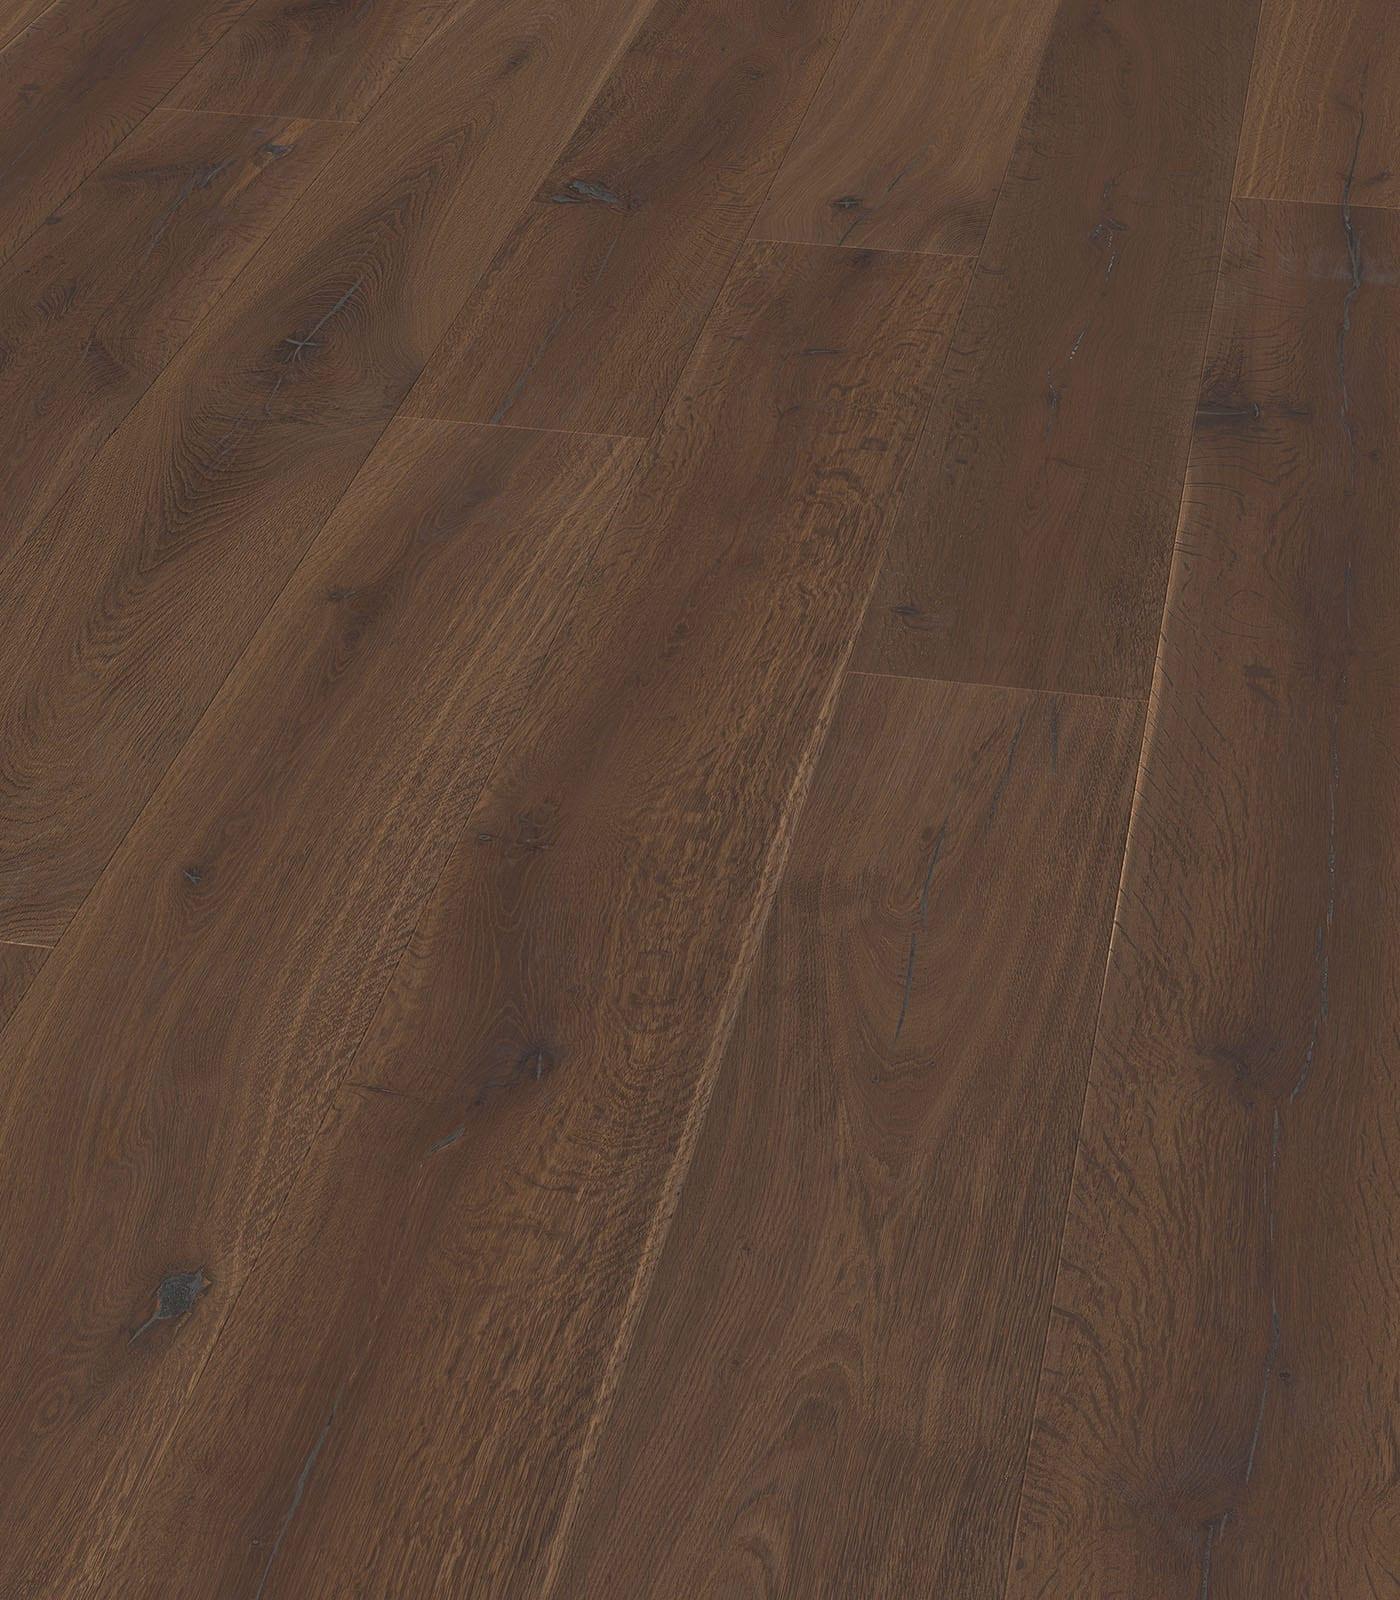 Zagros-Antique collection-European Oak Floors-angle